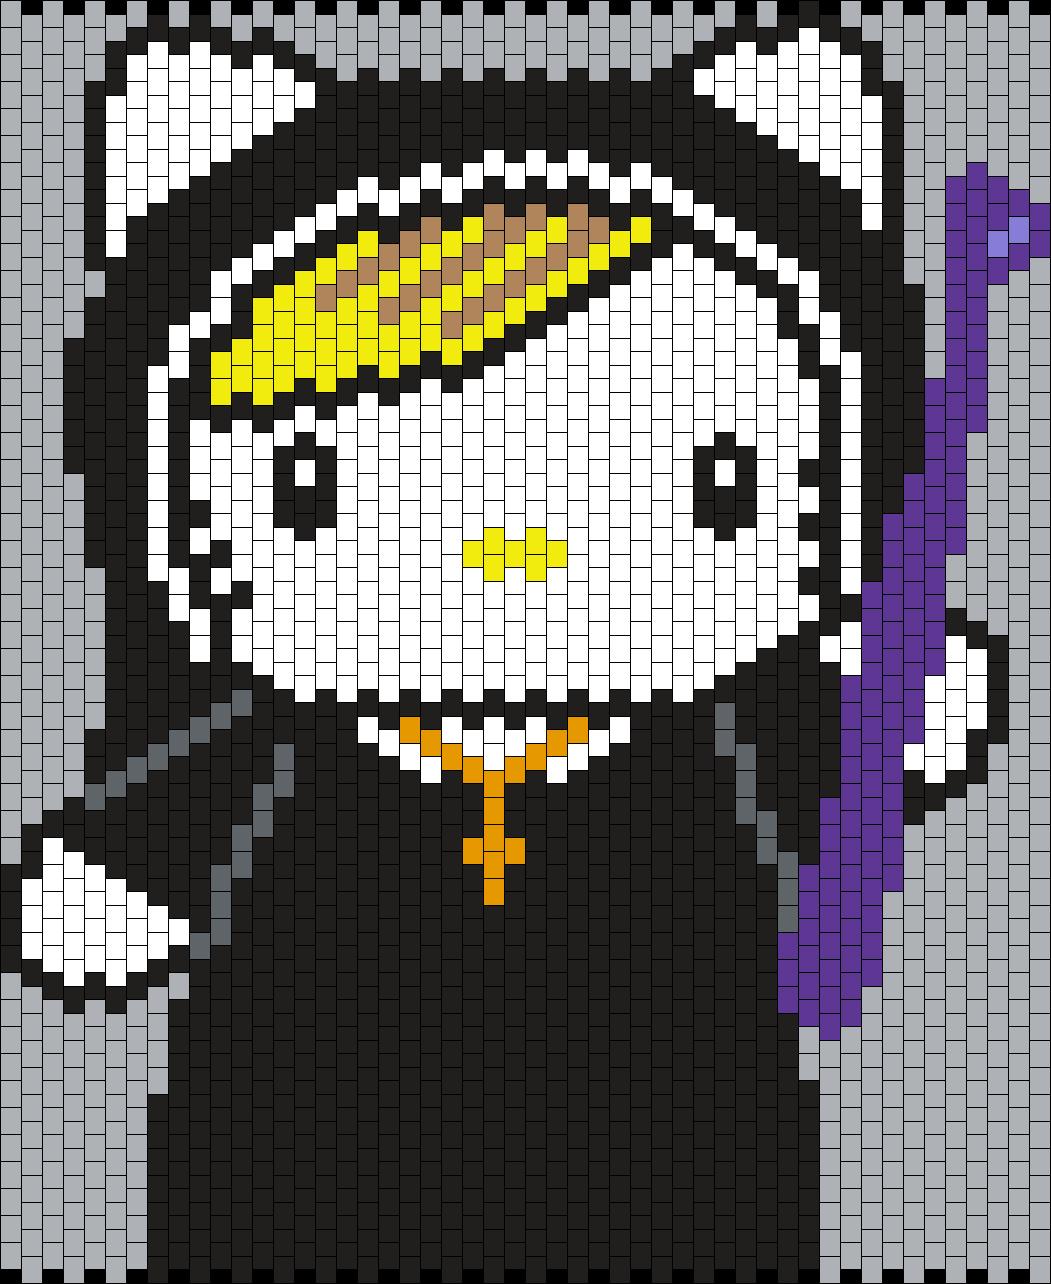 Sister Jude Hello Kitty From American Horror Story Asylum Bead Pattern